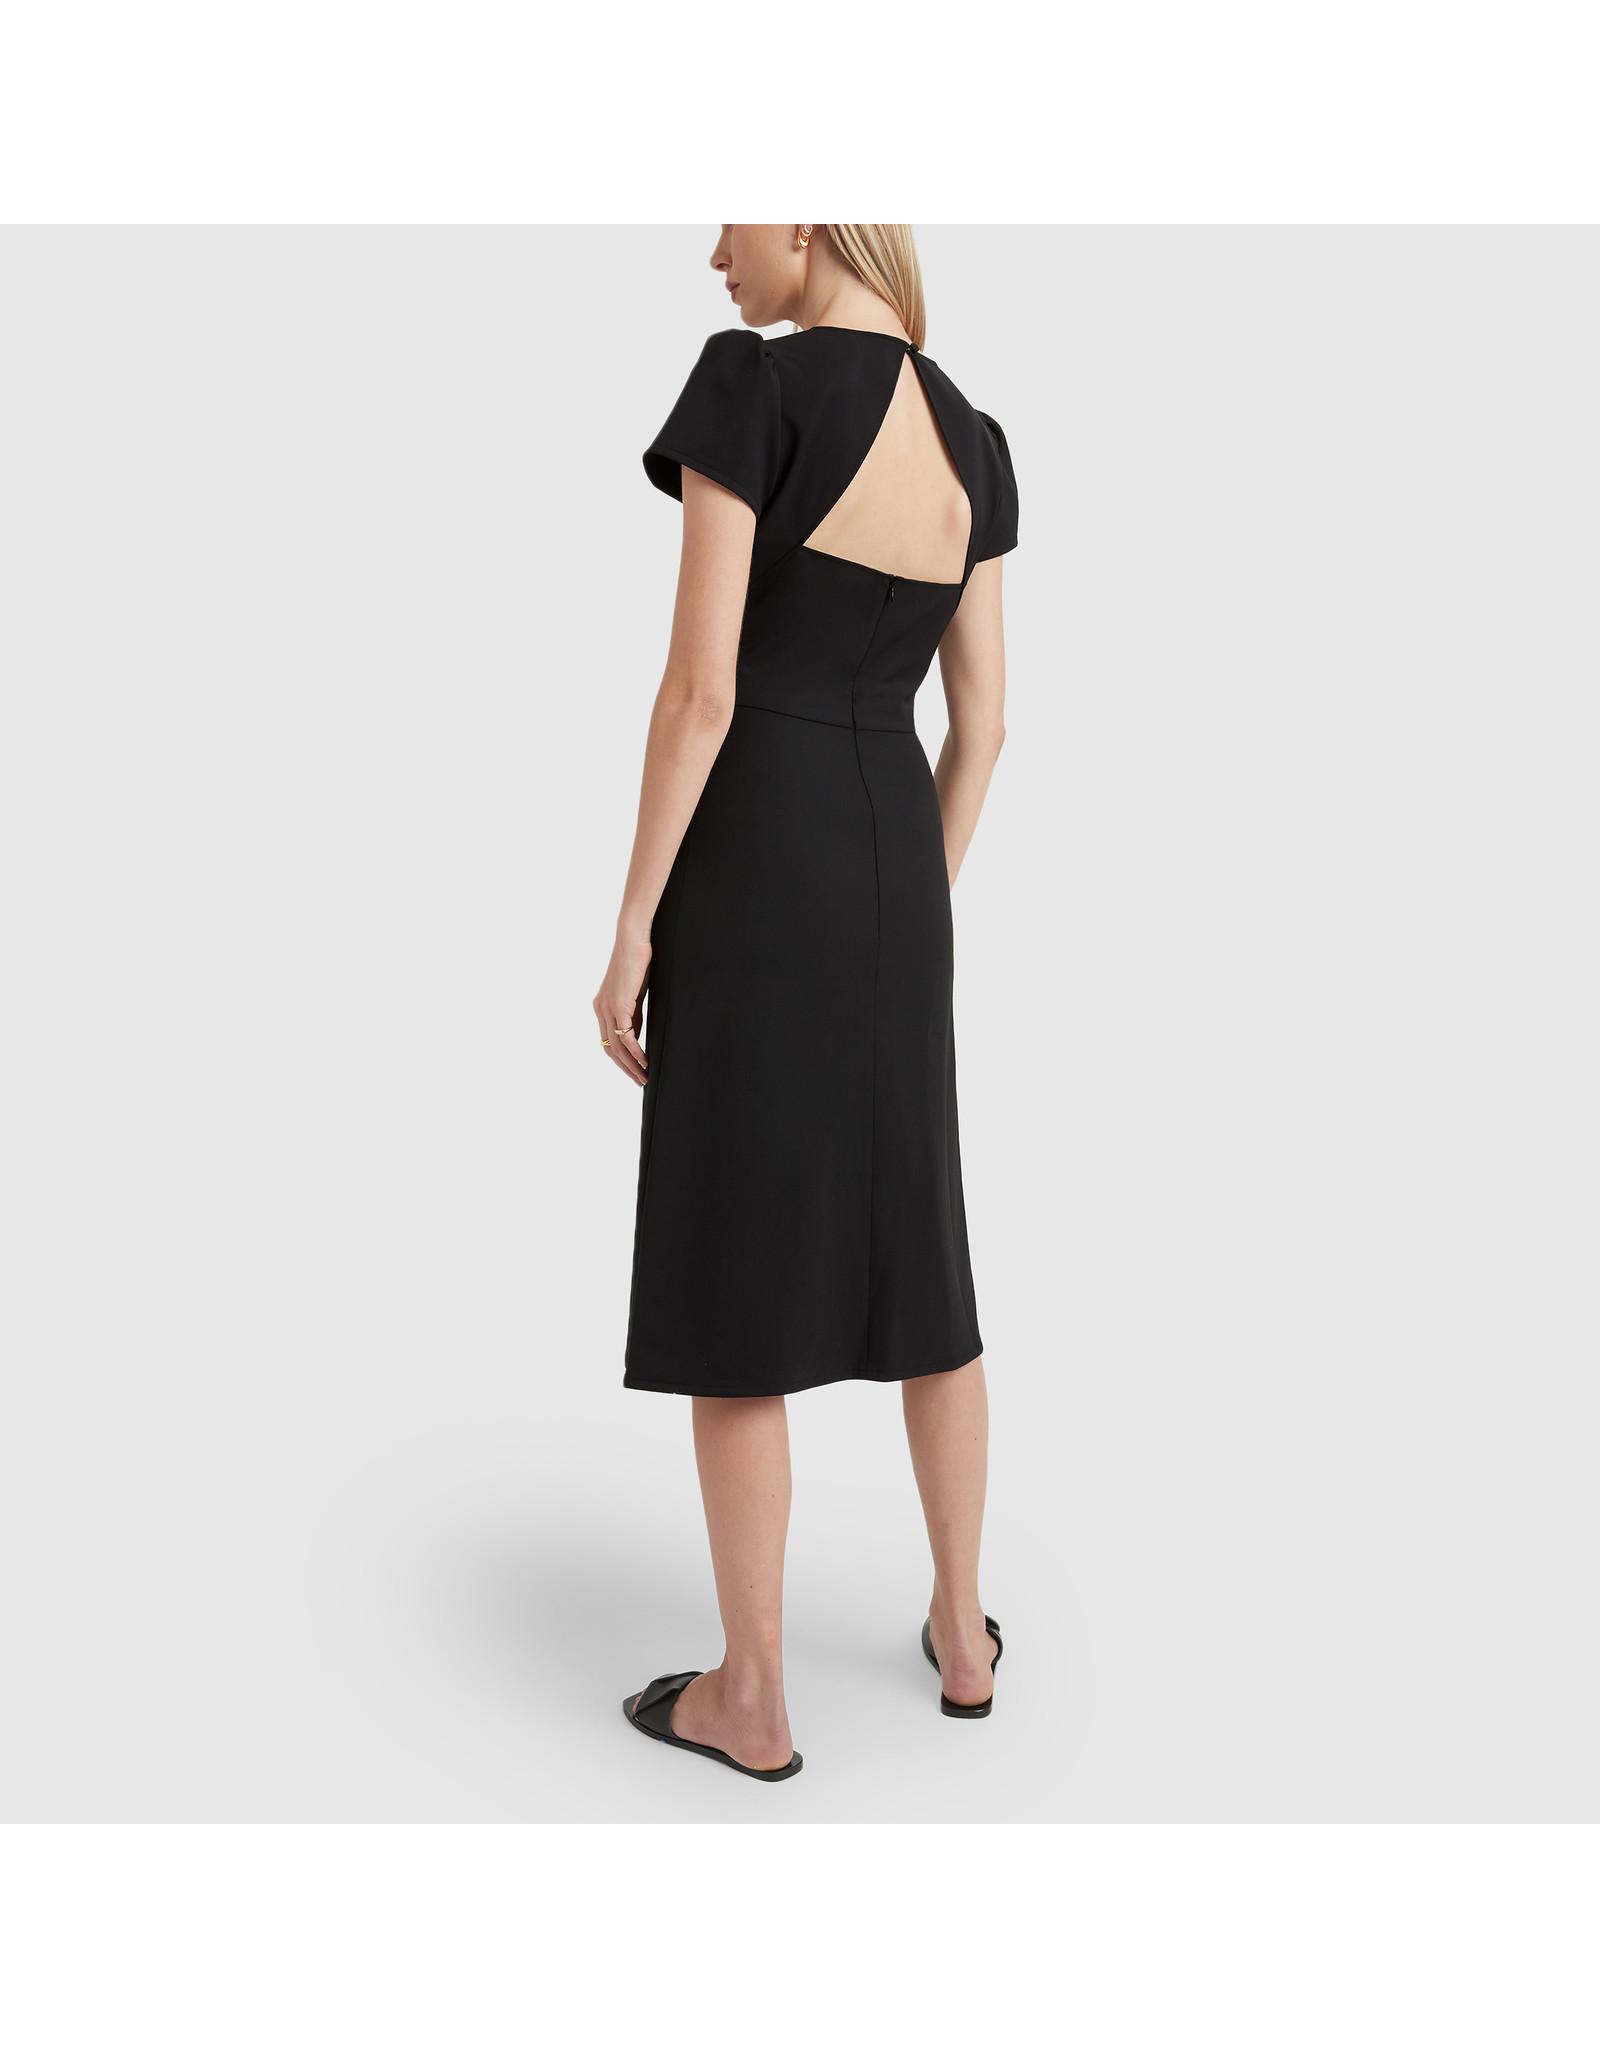 G. Label Ficchi Puff Sleeve Keyhole Back Dress (Color: Black, Size: 2)